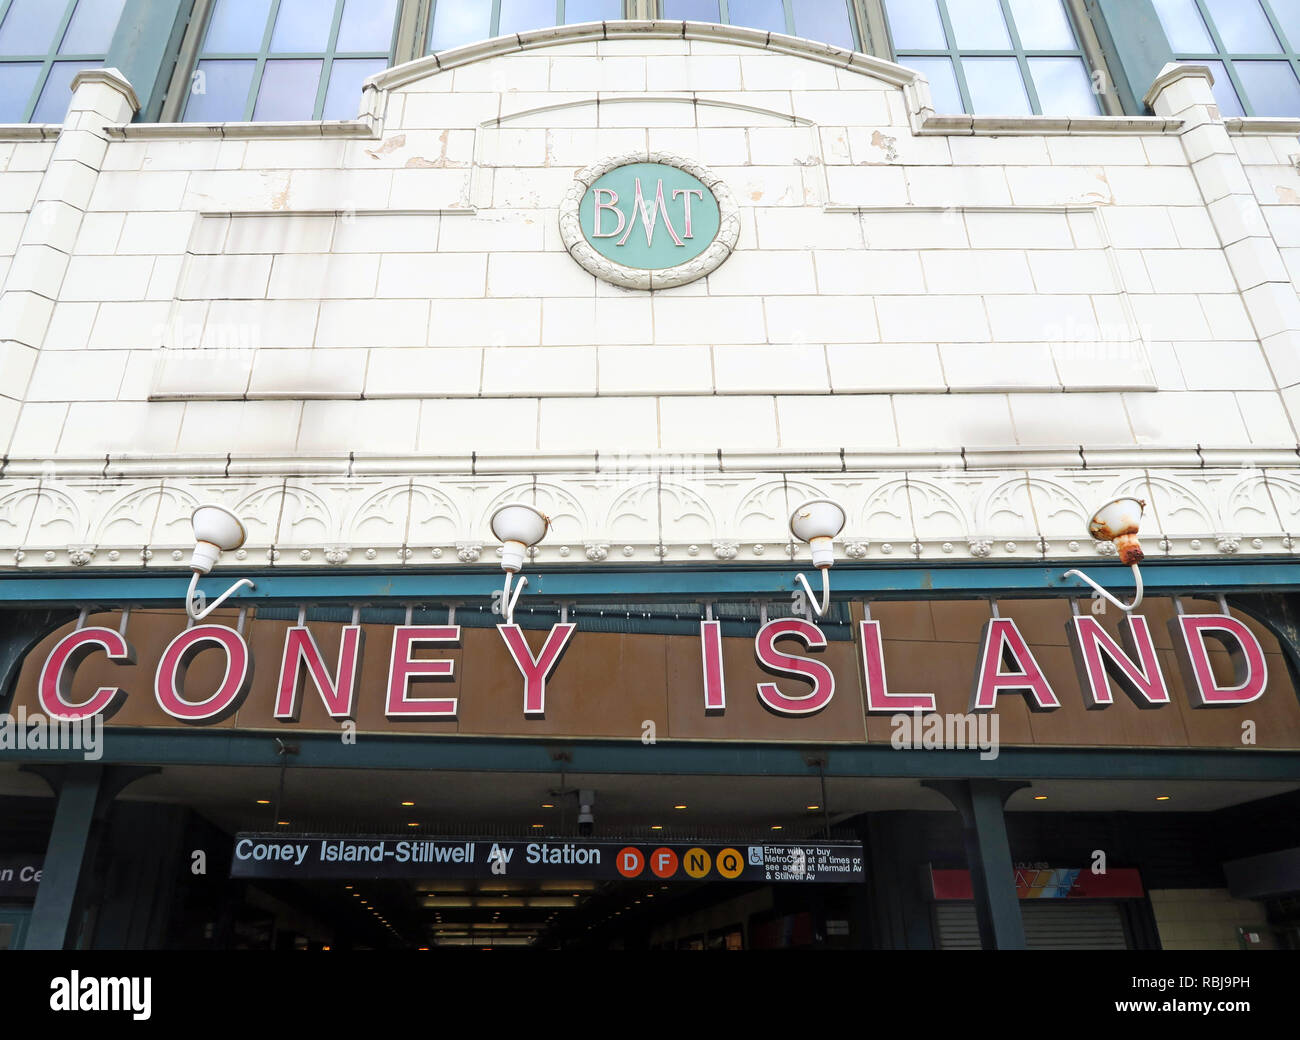 @HotpixUK,HotpixUK,GoTonySmith,NY,NYC,New York City,City,Centre,City Centre,street,USA,United states of America,United States,Brooklyn,Borough Of Brooklyn,peninsular,leisure,entertainment,tourist,tourism,destination,run down,rundown,dilapidated,seaside resort,seaside,US,Fred Trump,Fred,Trump,Thor Equities,parks,NYC Parks,subway,station,New York City Subway terminal in Coney Island